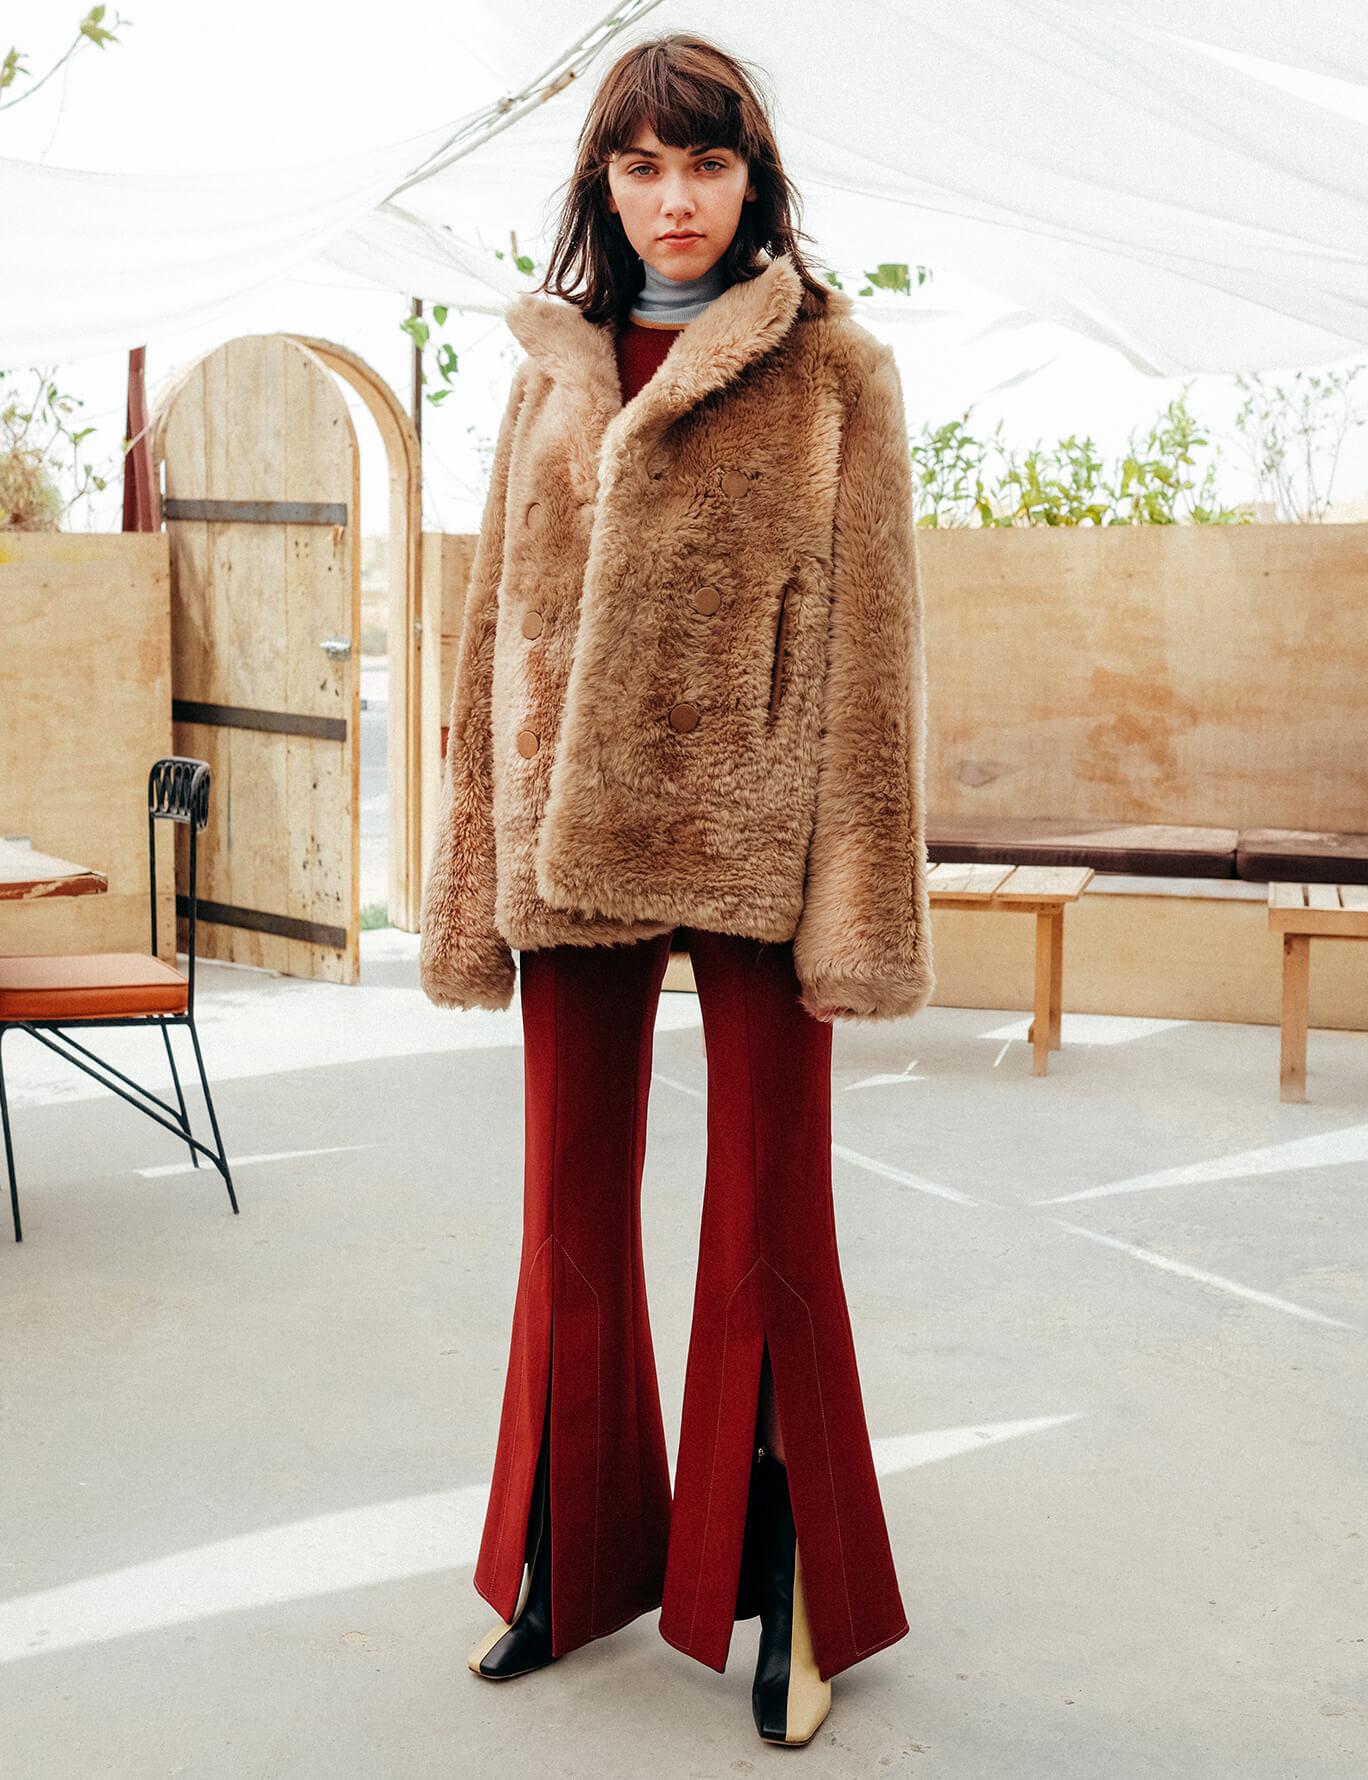 the-mod-the-modist-modest-fashion-7.jpg